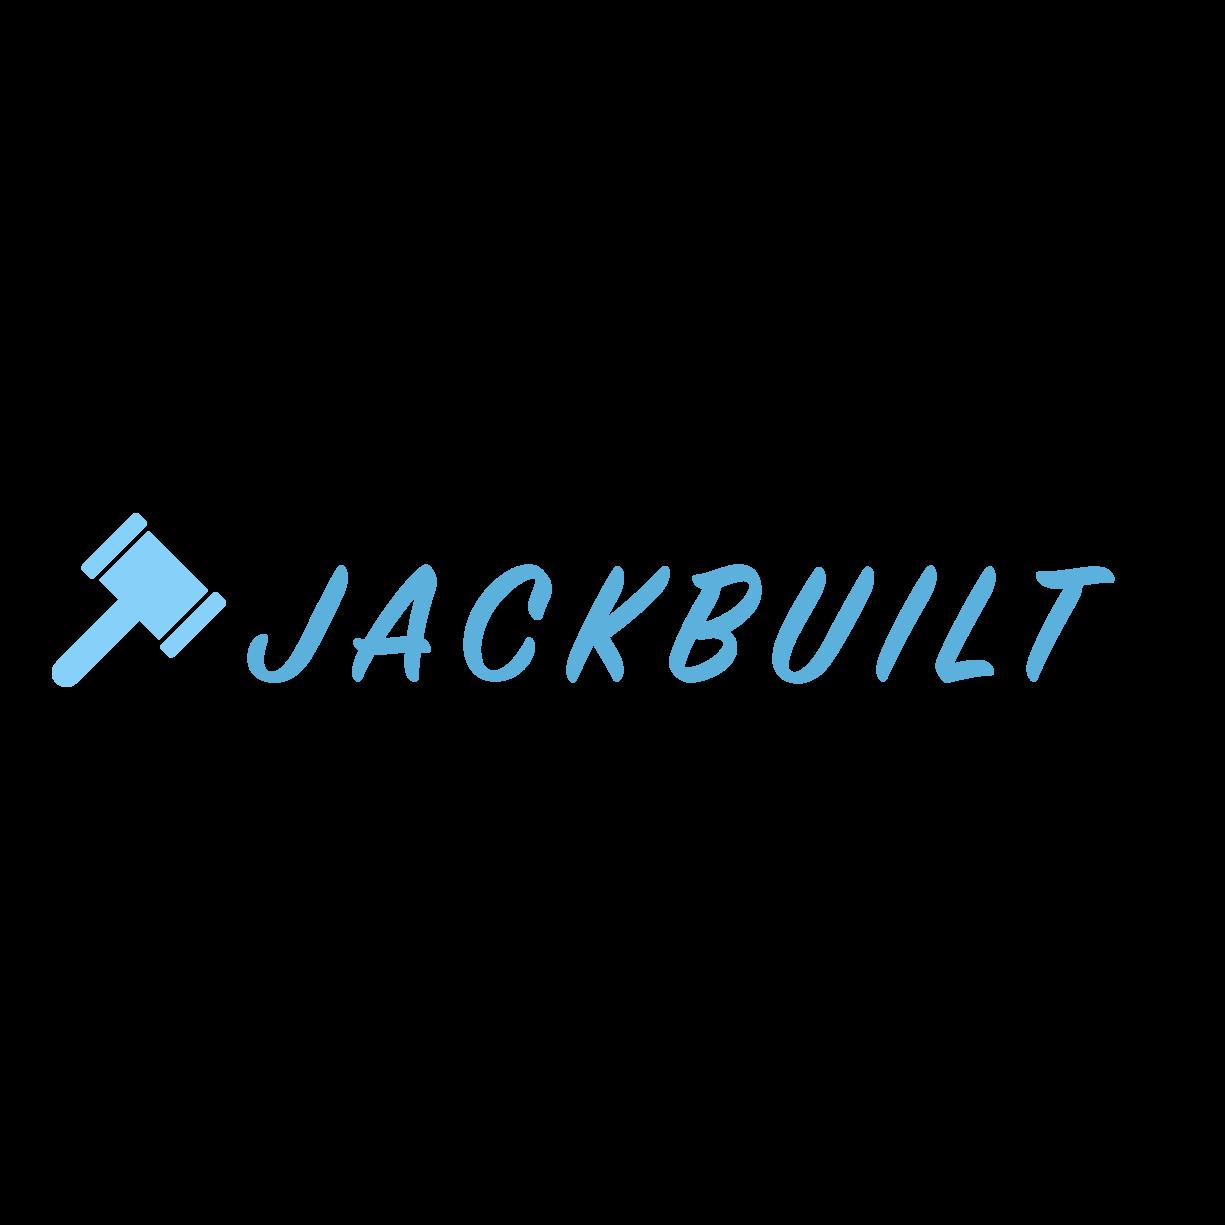 JackBuilt image 8